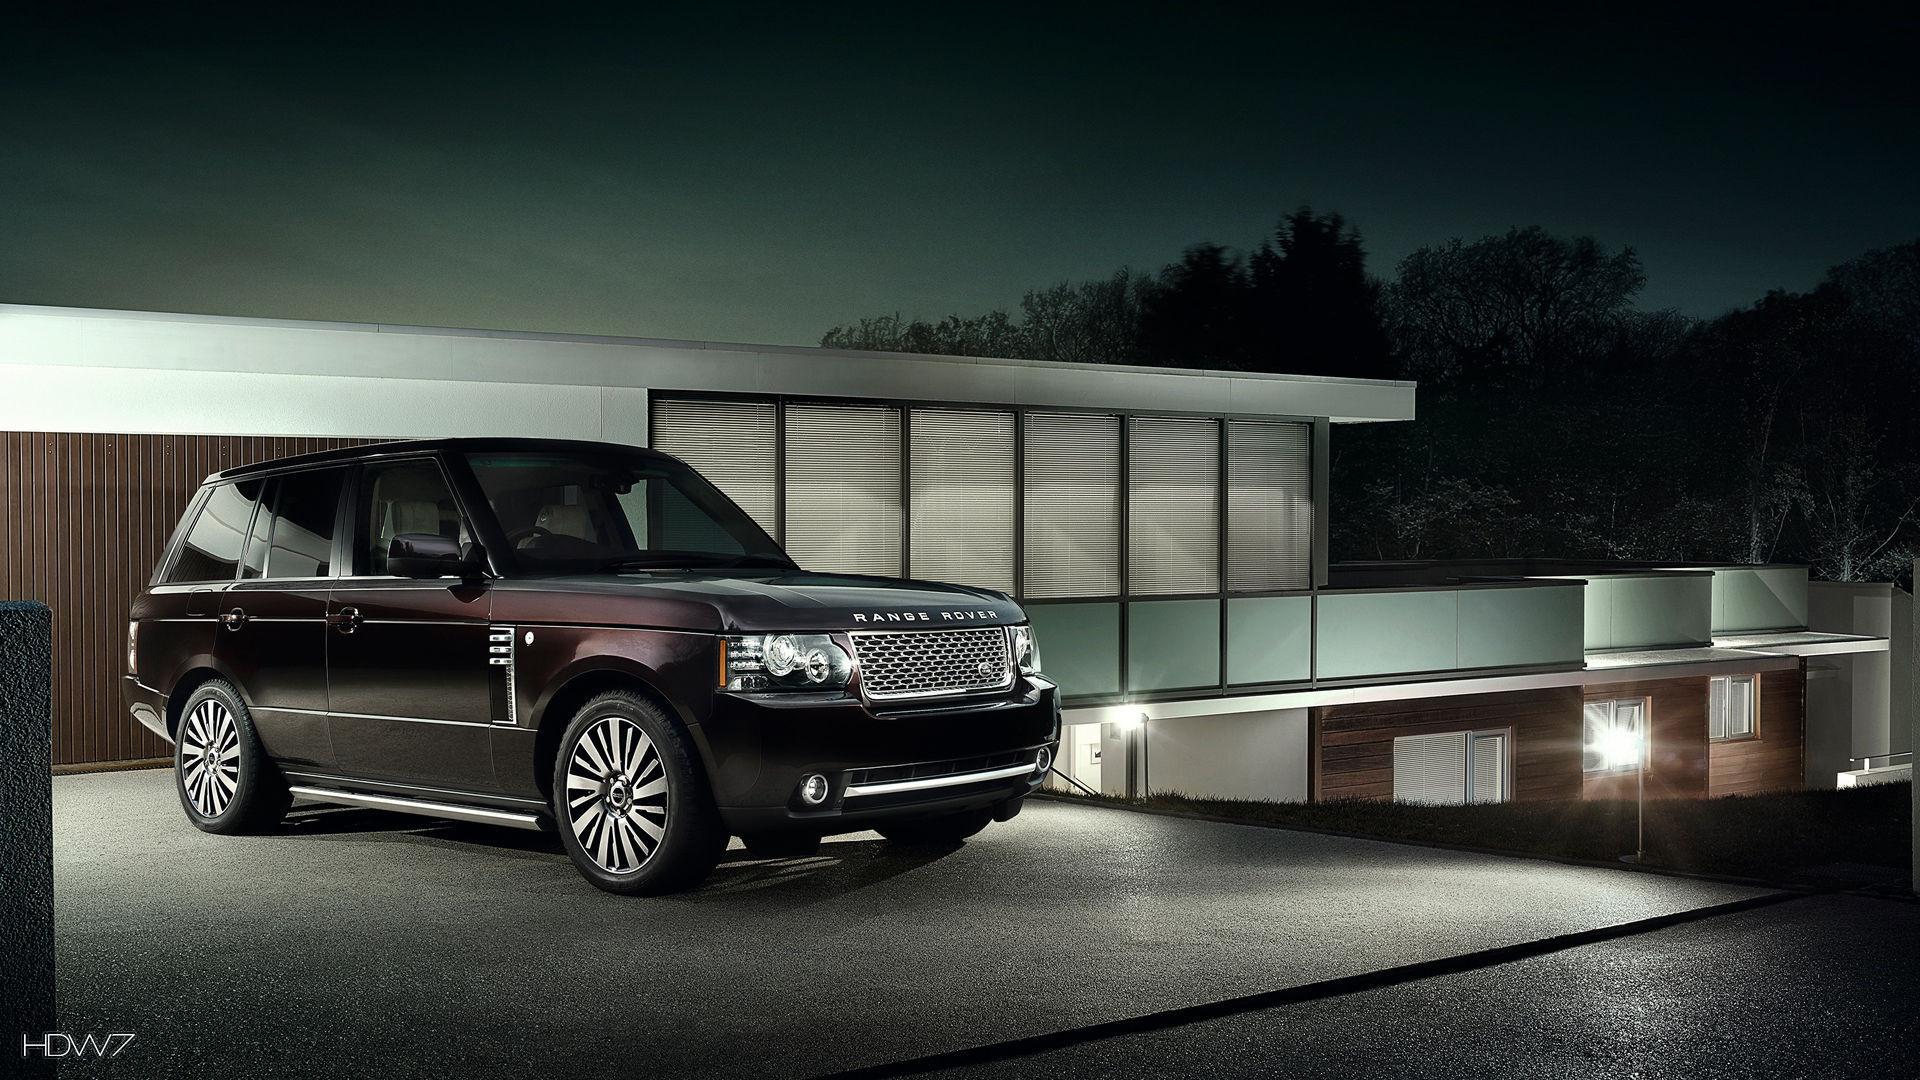 Range Rover Sport Wallpapers Wallpaper